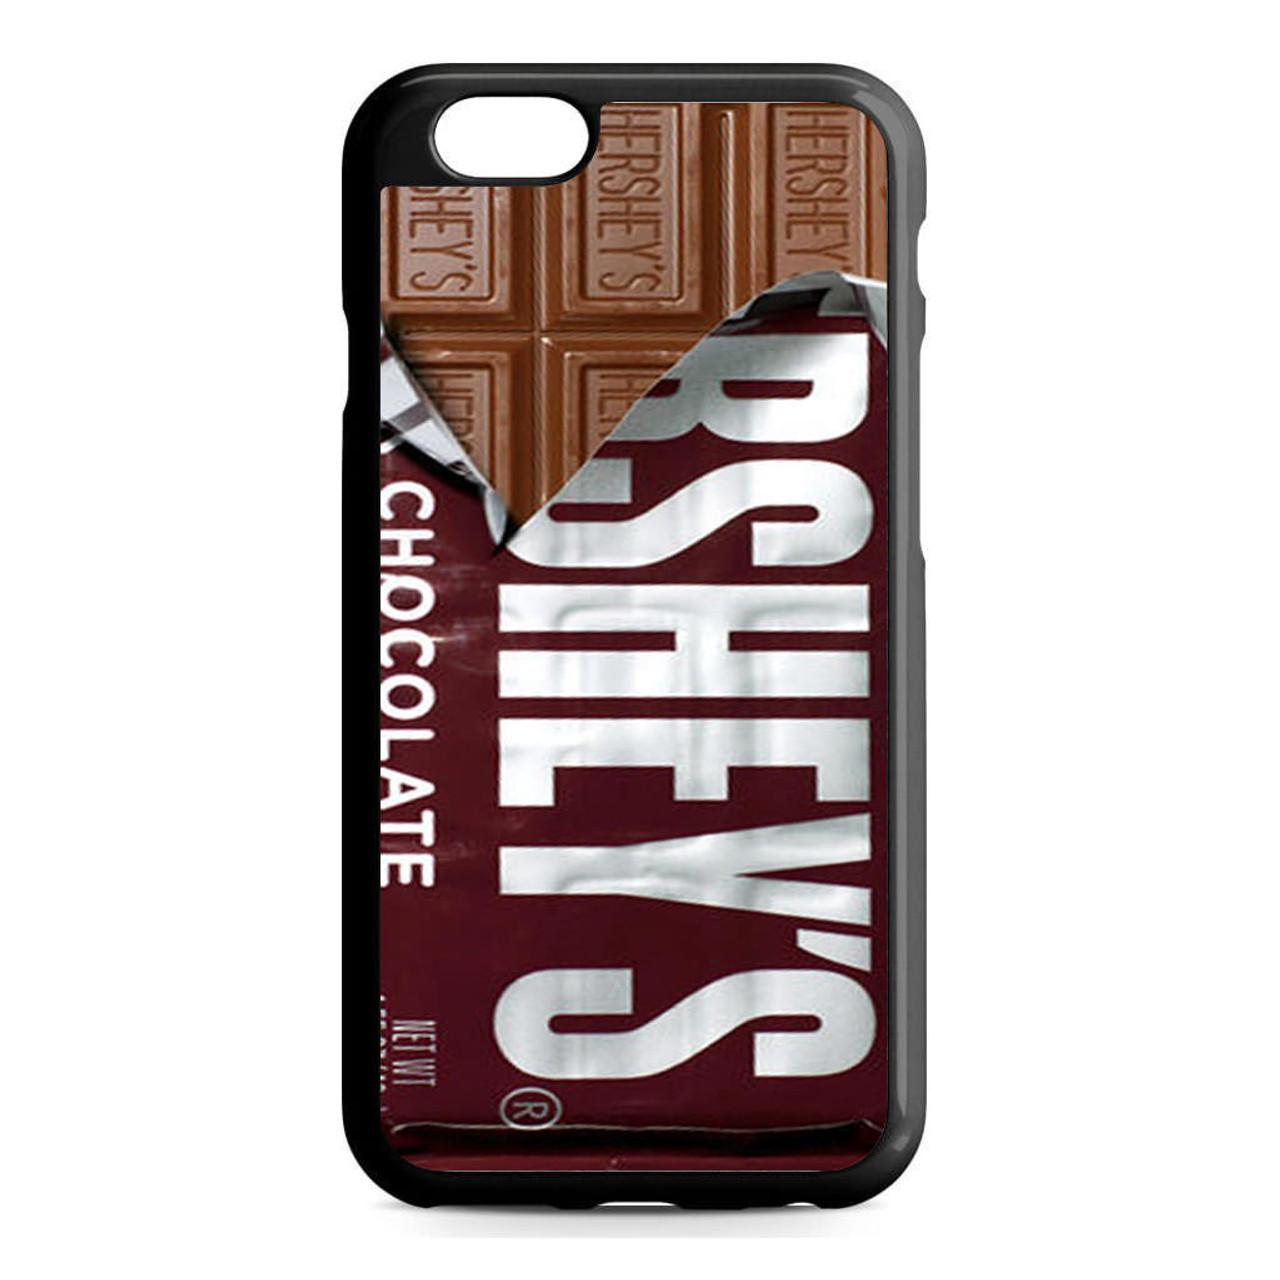 c7920570f933 Hershey s Chocolate Candybar iPhone 6 6S Case - GGIANS